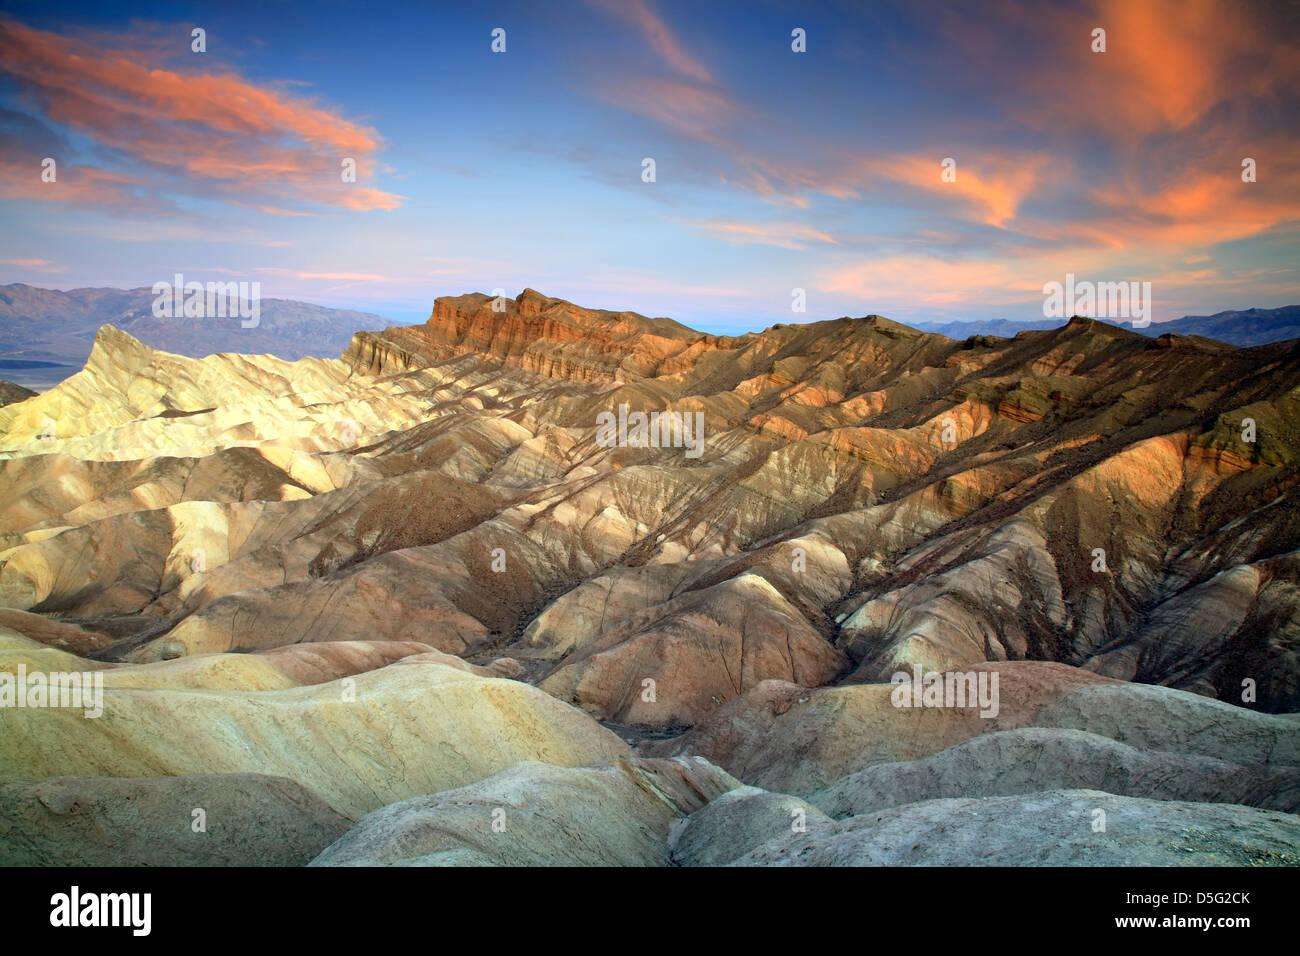 Manley Beacon (L), Cathedral Rock (R) et de badlands, Zabriskie Point, Death Valley National Park, California USA Photo Stock